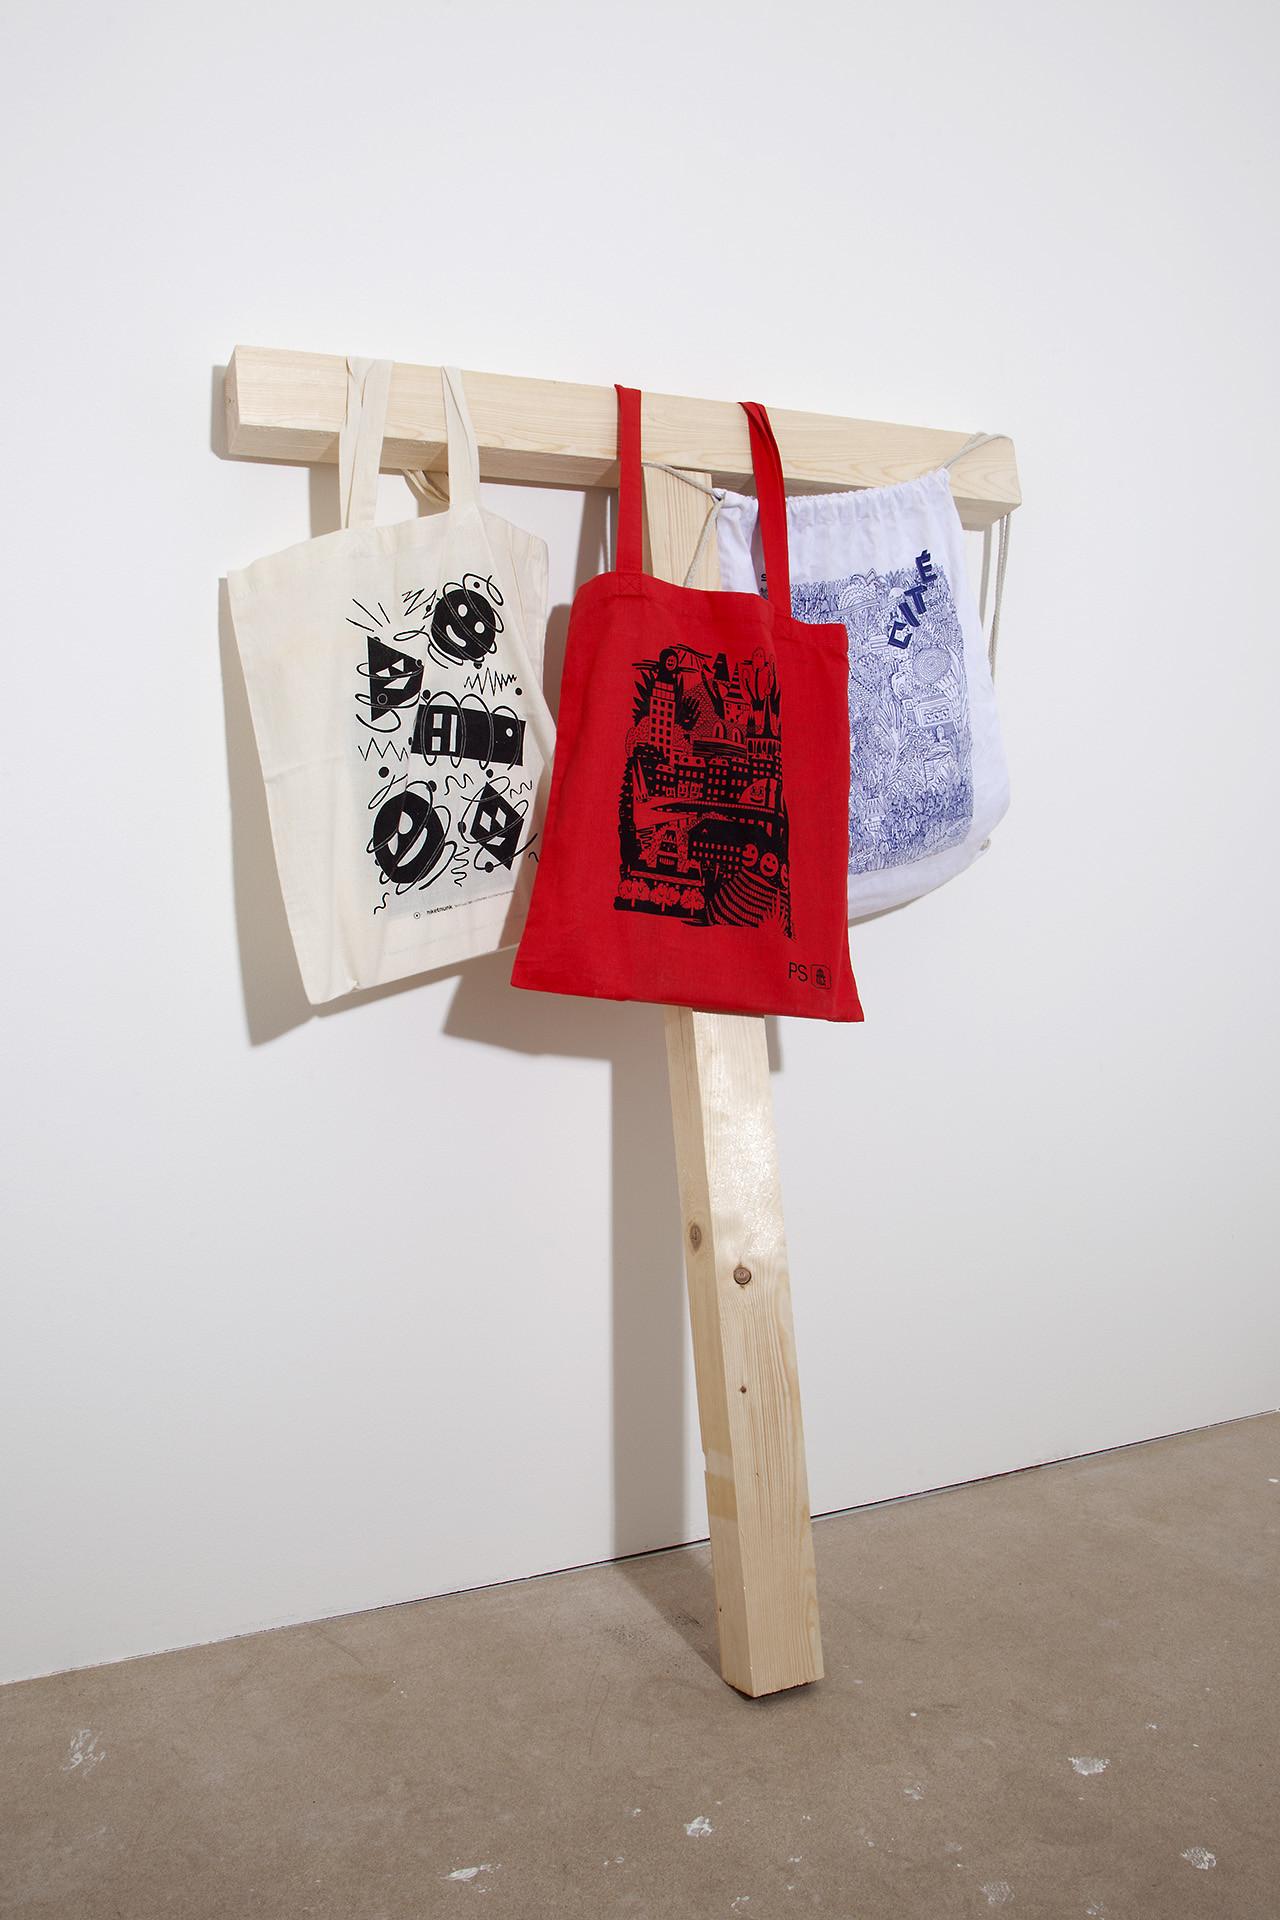 FICHTRE STUDIO - Mathias Forbach MERCH'